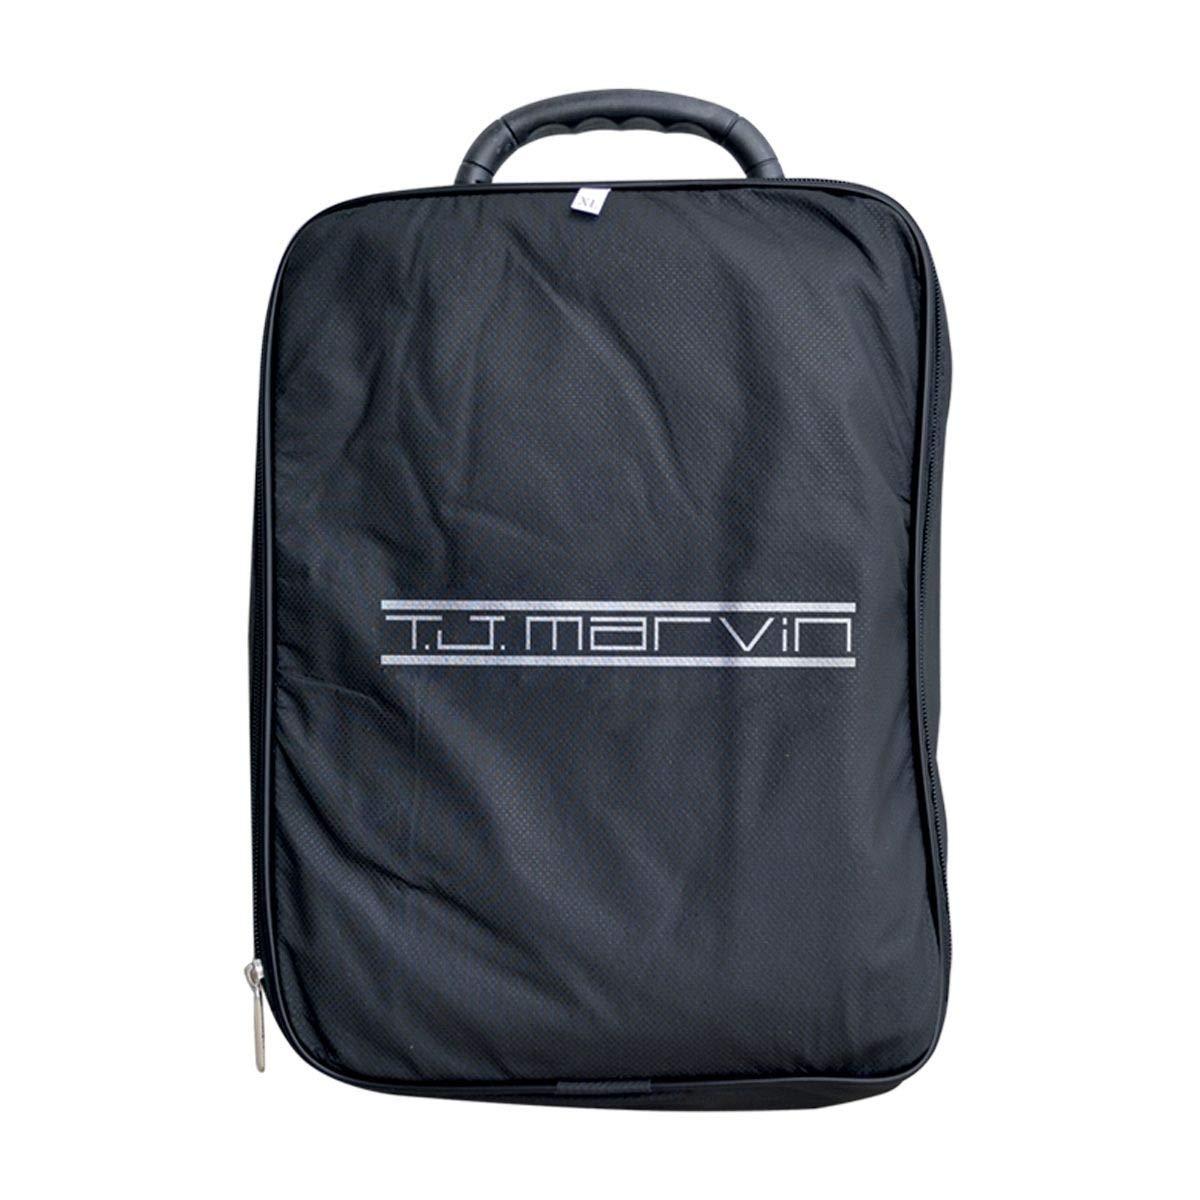 Funda para Moto XL 246-104-127 cm TJ Marvinc